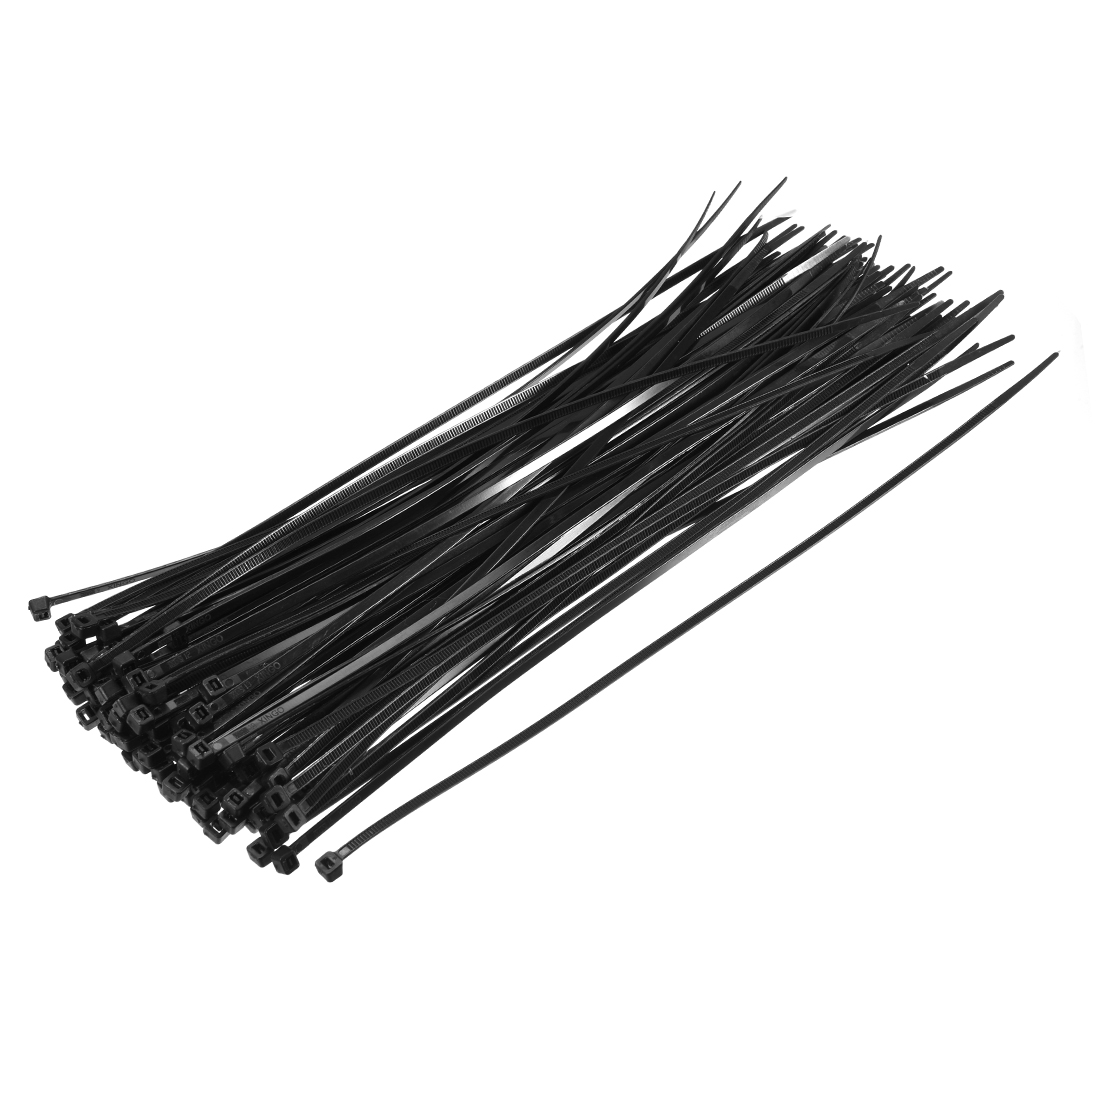 Cable Zip Ties 200mmx2.8mm Self-Locking Nylon Tie Wraps Black 500pcs